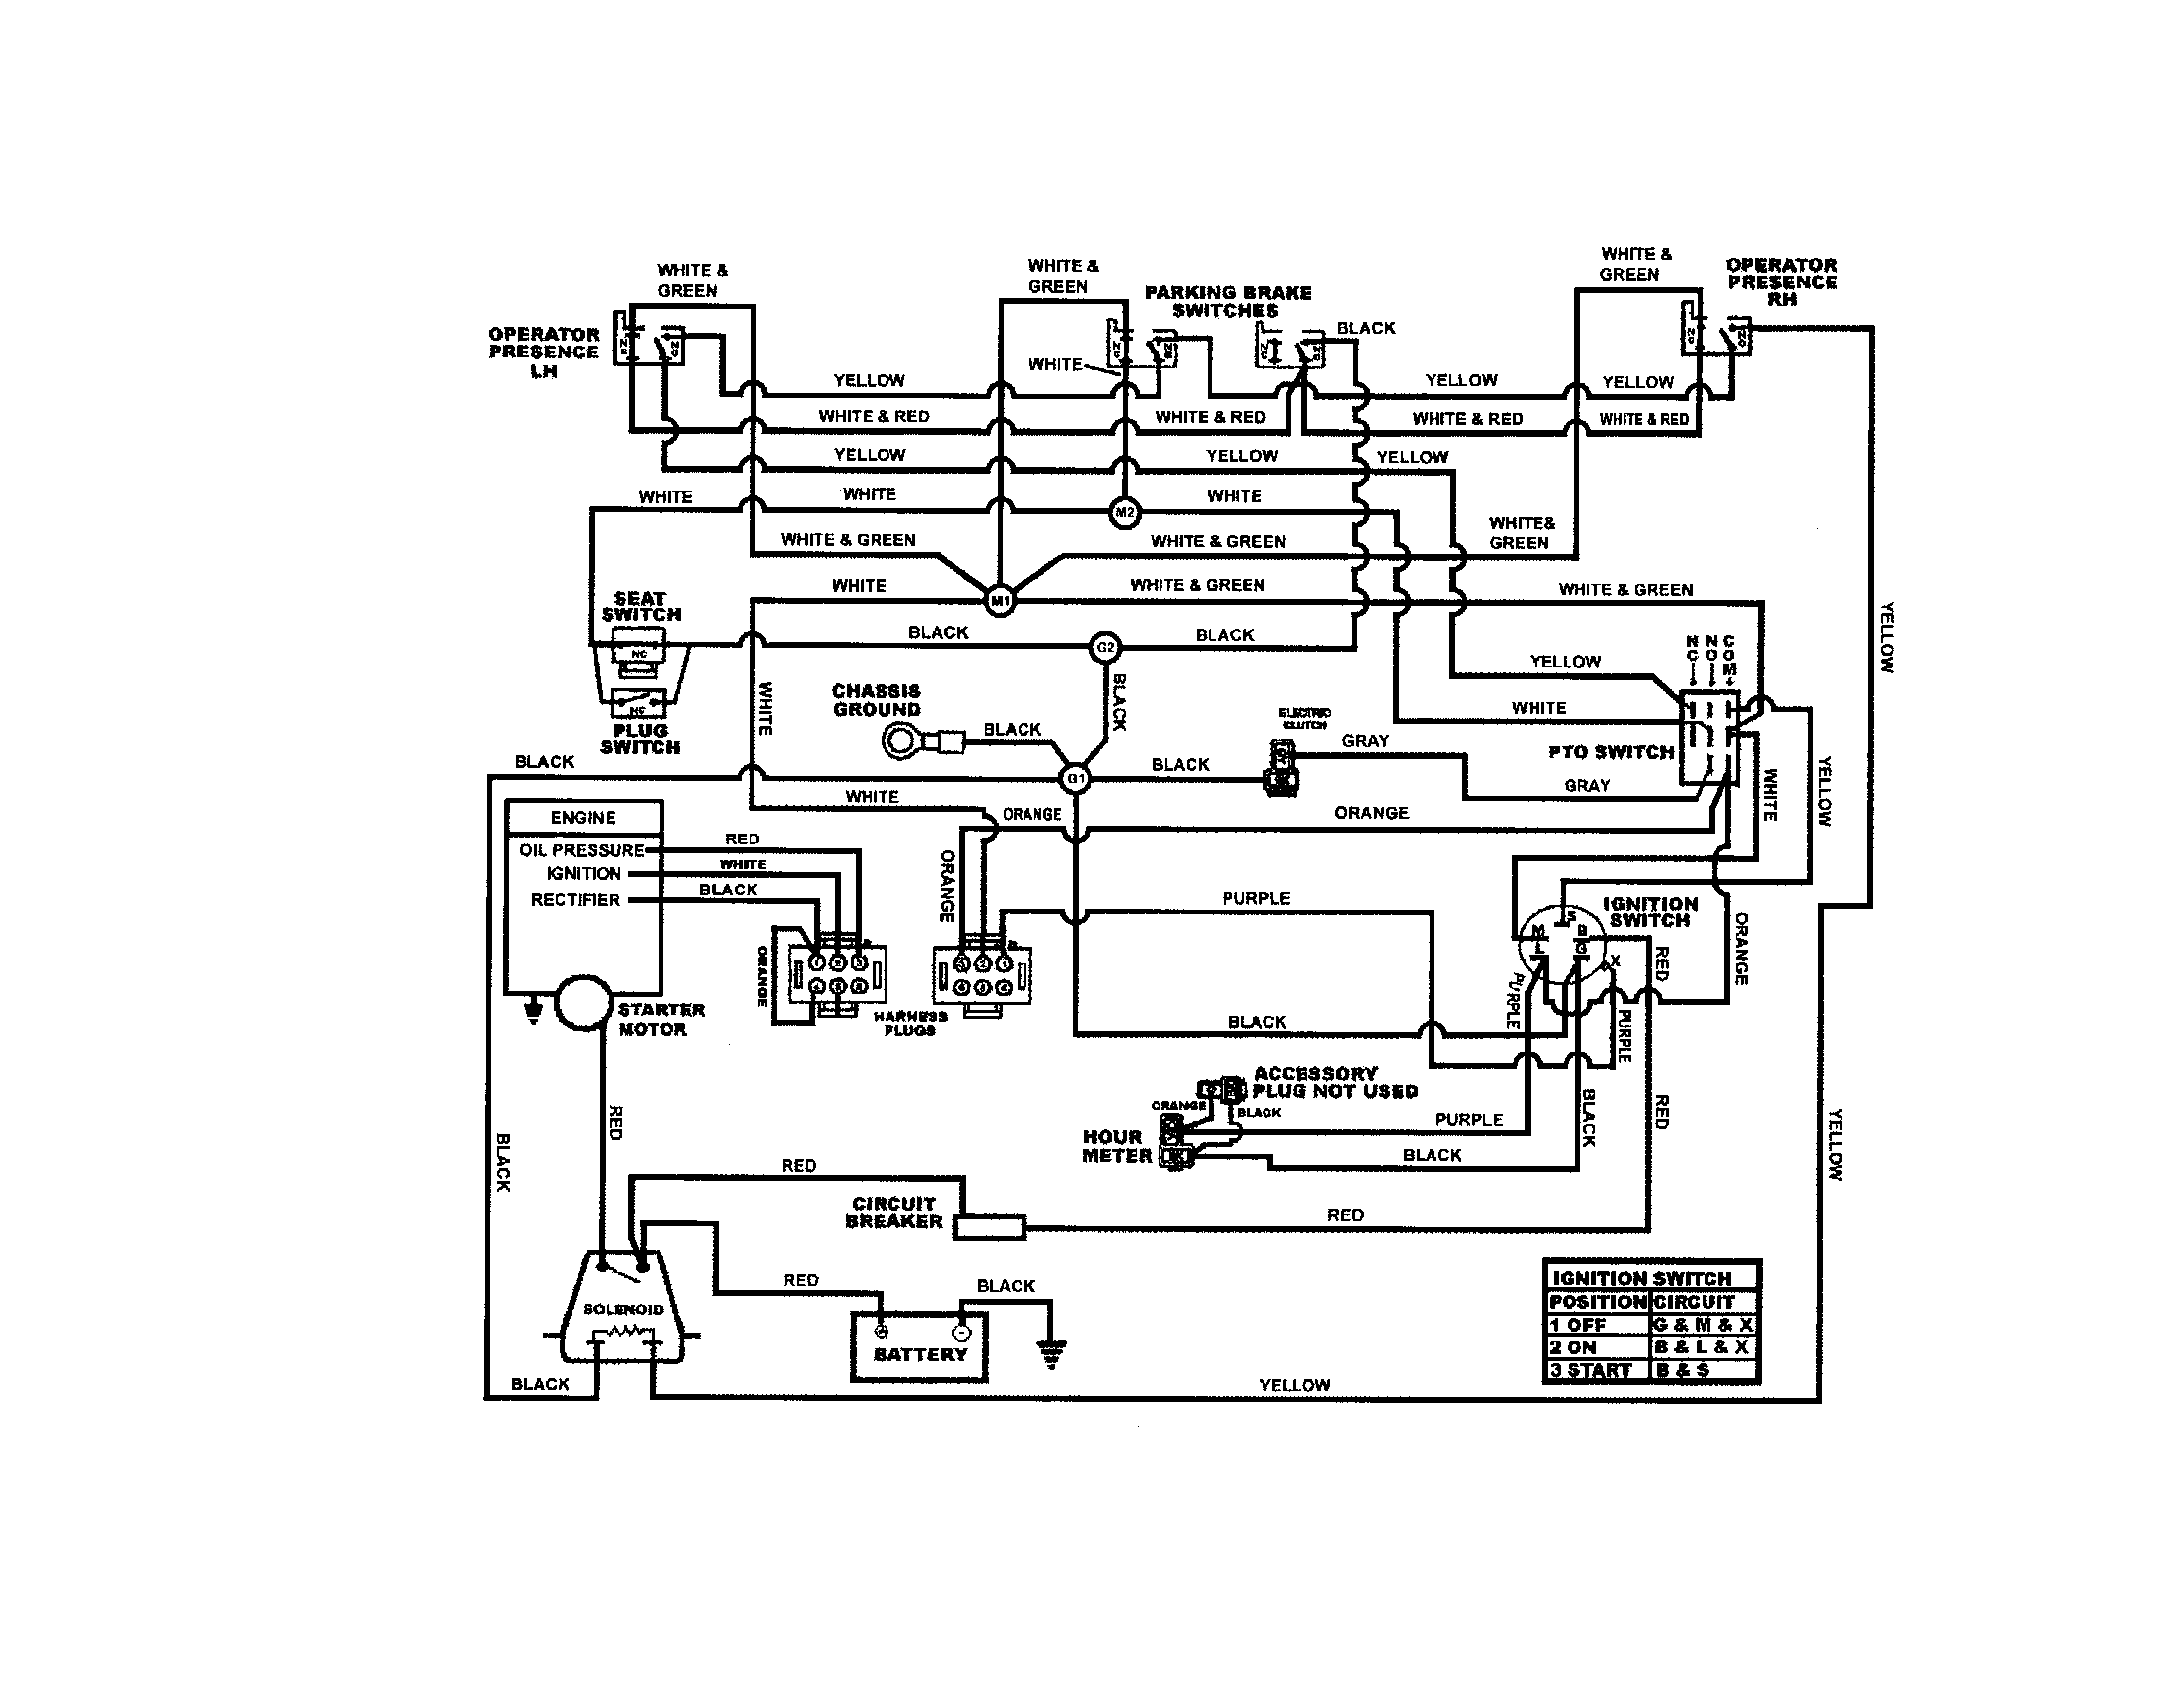 P0810012 00026?resize=665%2C512 scintillating briggs and stratton 18 hp wiring diagram briggs and stratton 18 hp twin wiring diagram at soozxer.org